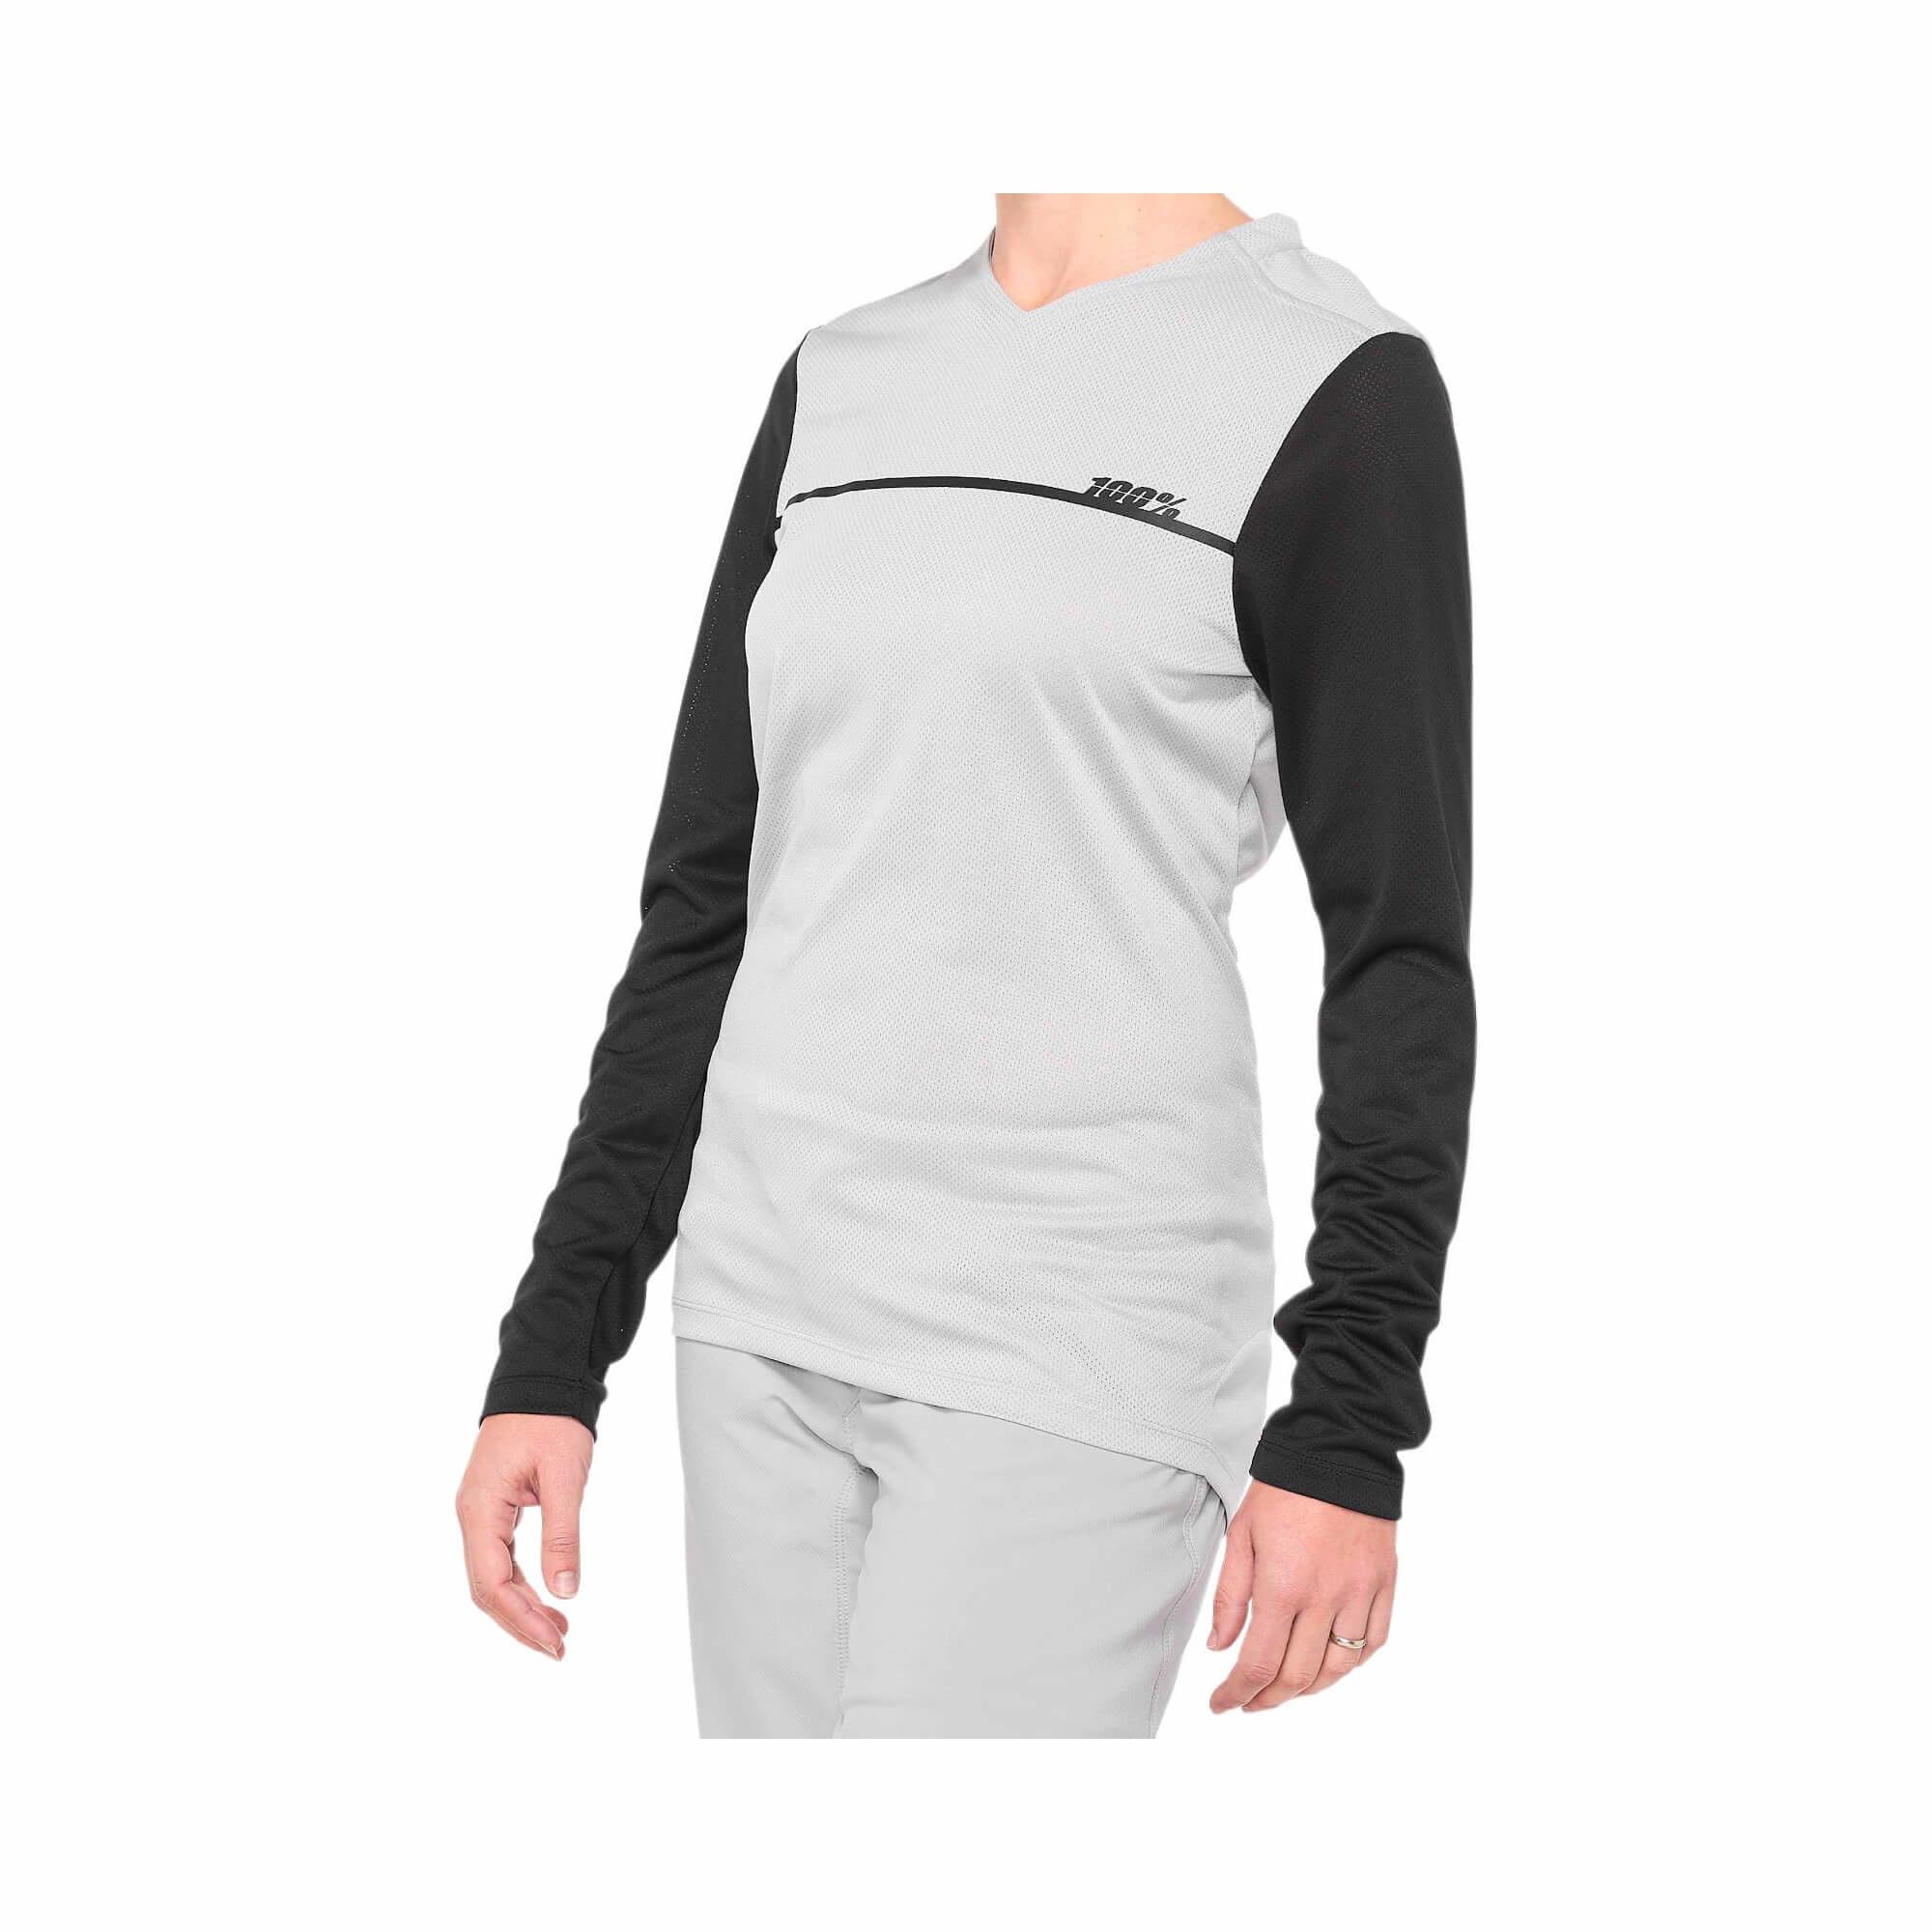 Ridecamp Women's Long Sleeve Jersey-1